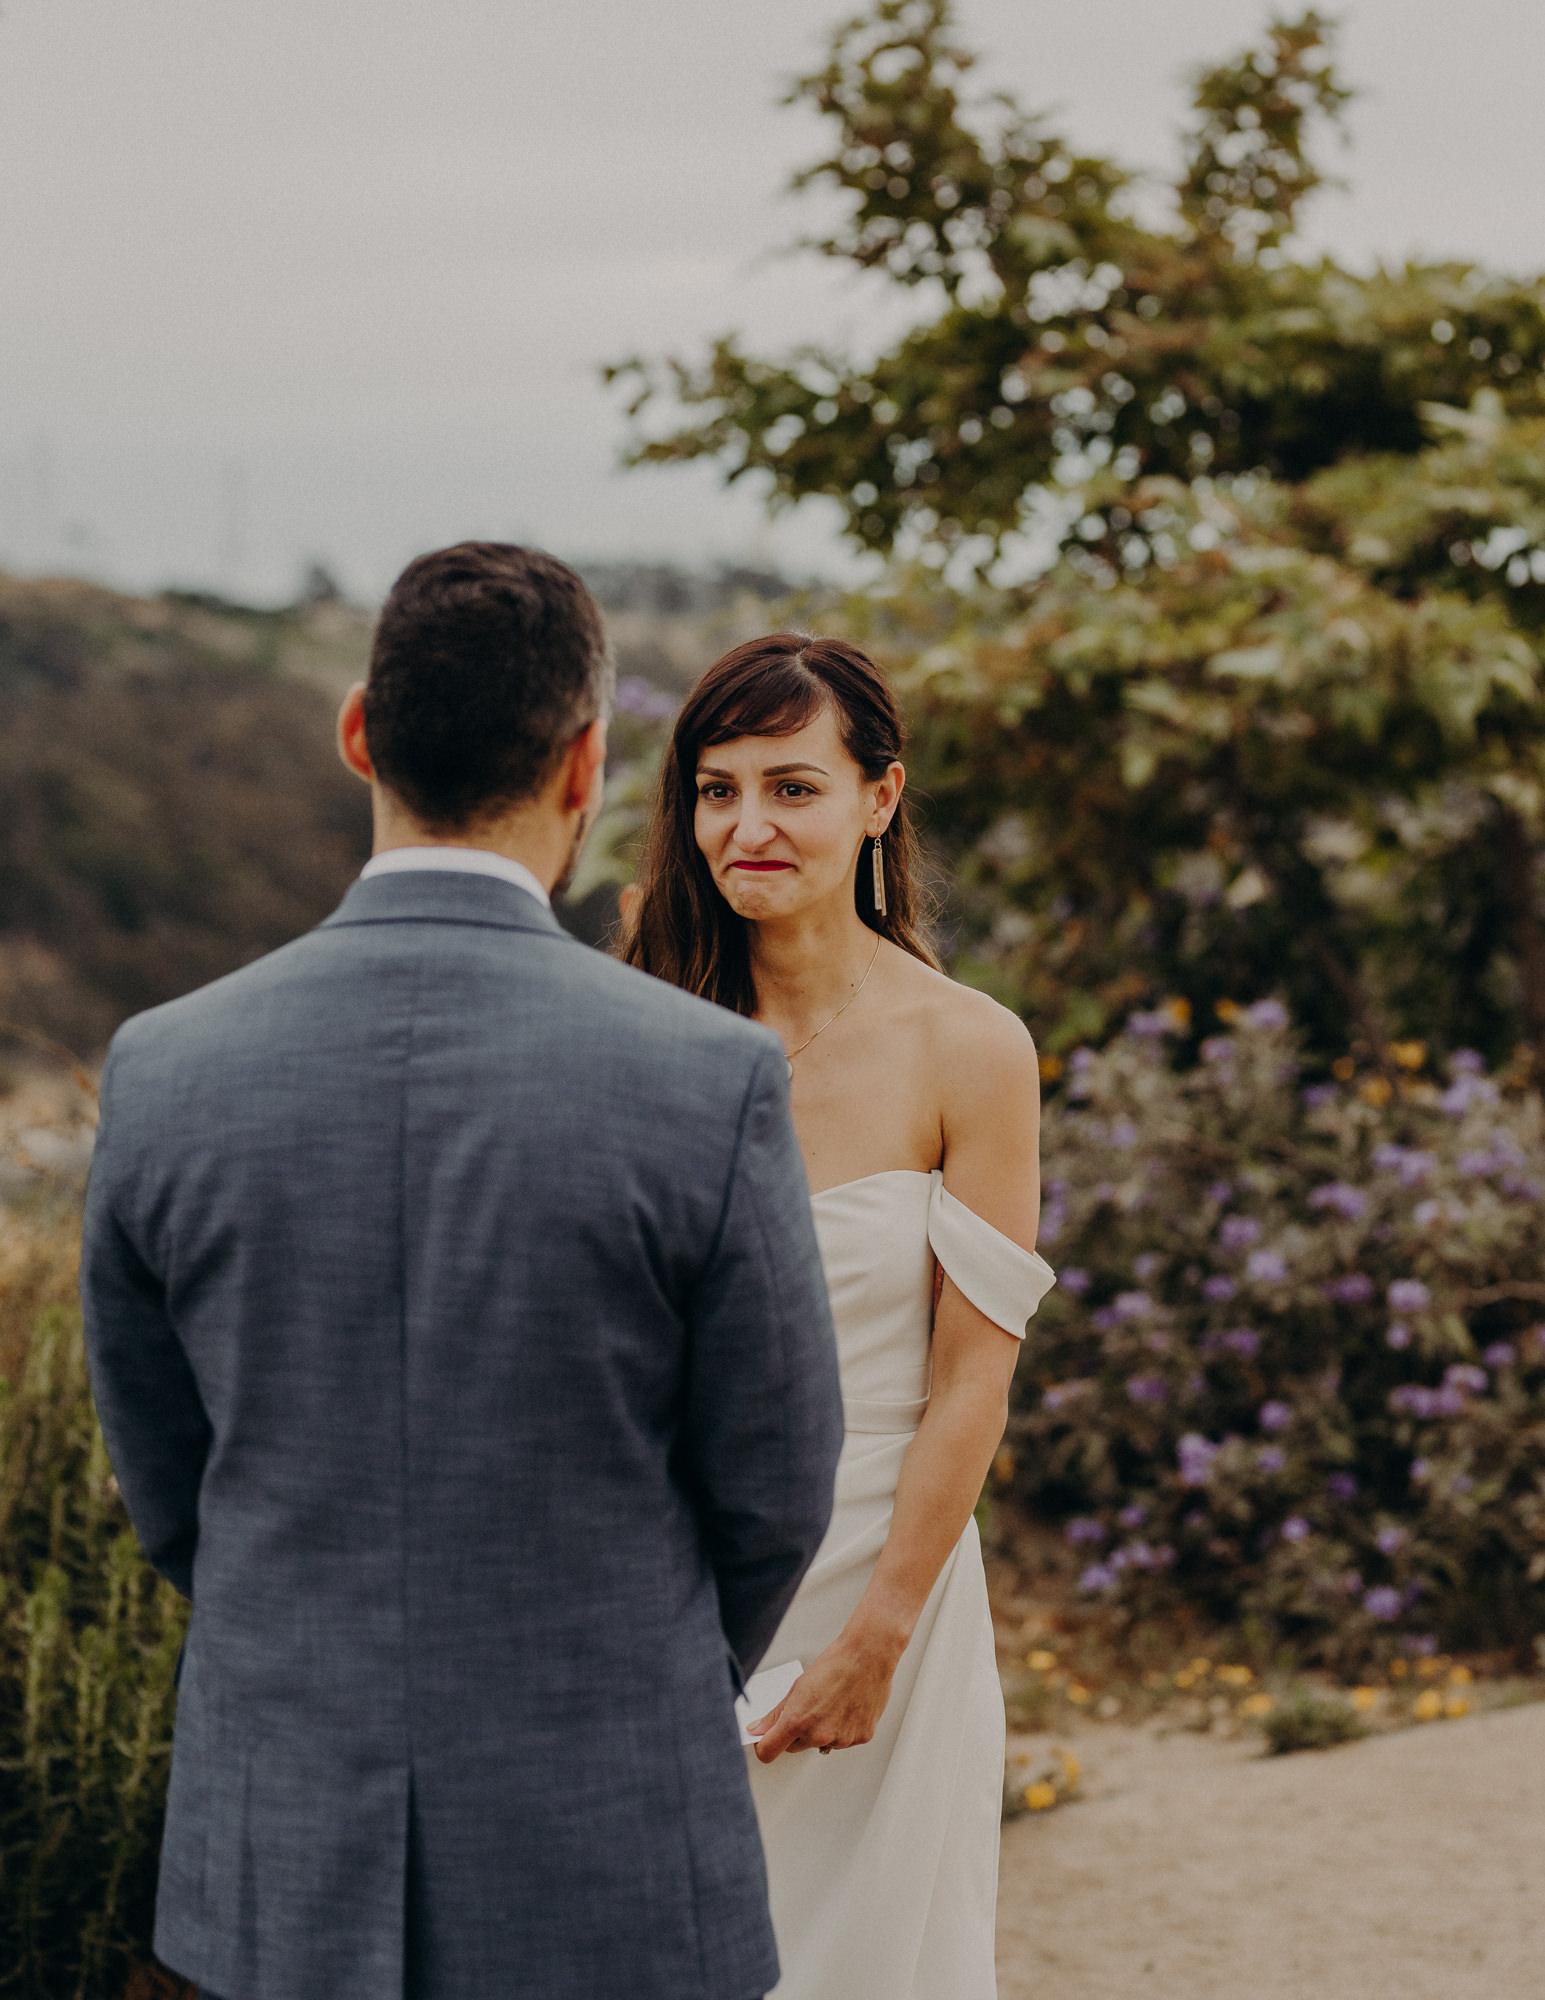 elopement photographer in los angeles - la wedding photographer - isaiahandtaylor.com-064.jpg